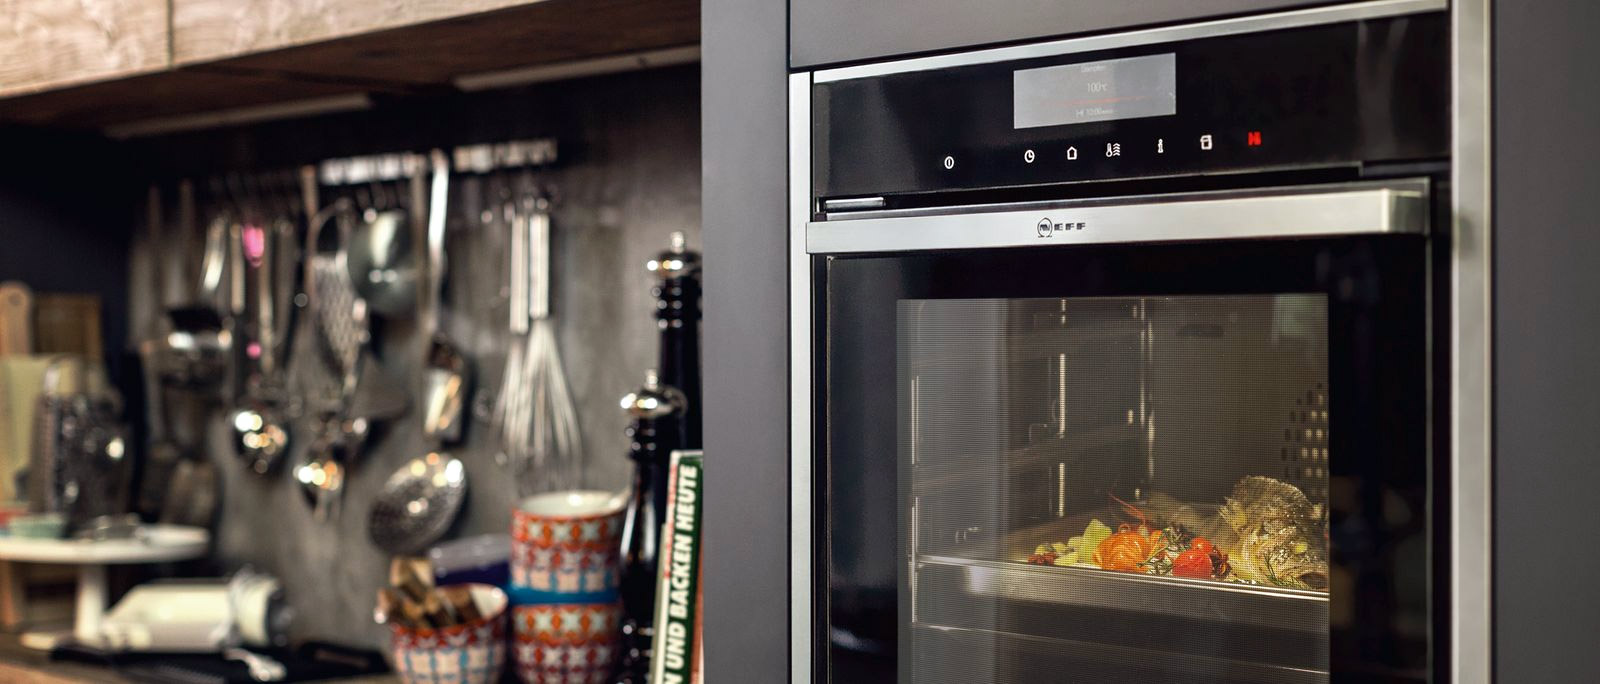 Neff Appliances by Kuche & Bagno